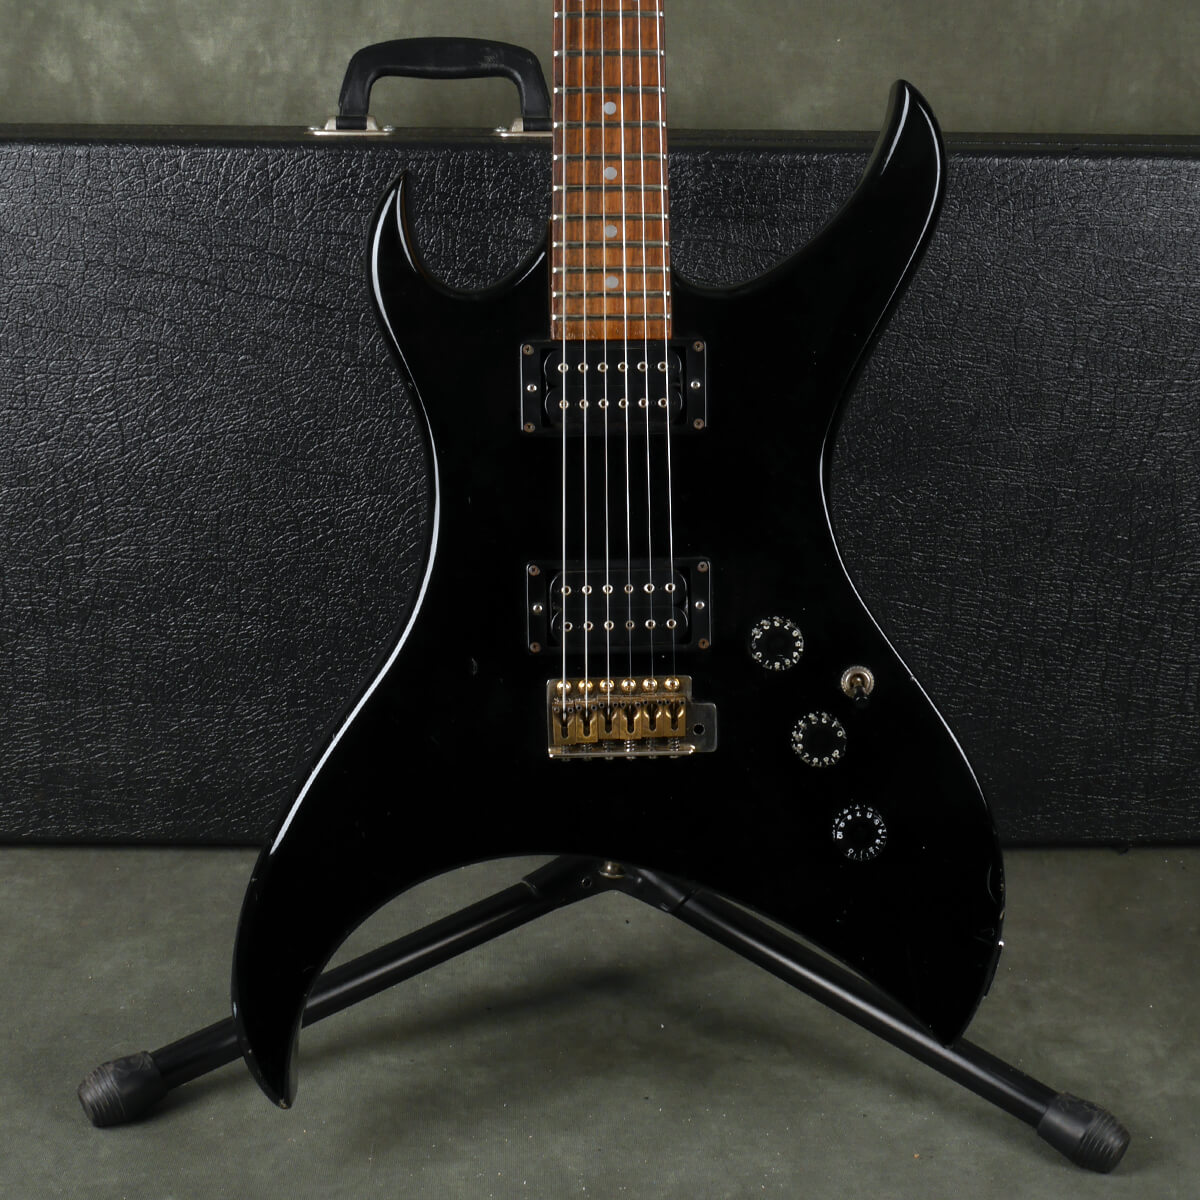 Aria Urchin Electric Guitar - Black w/Hard Case - 2nd Hand